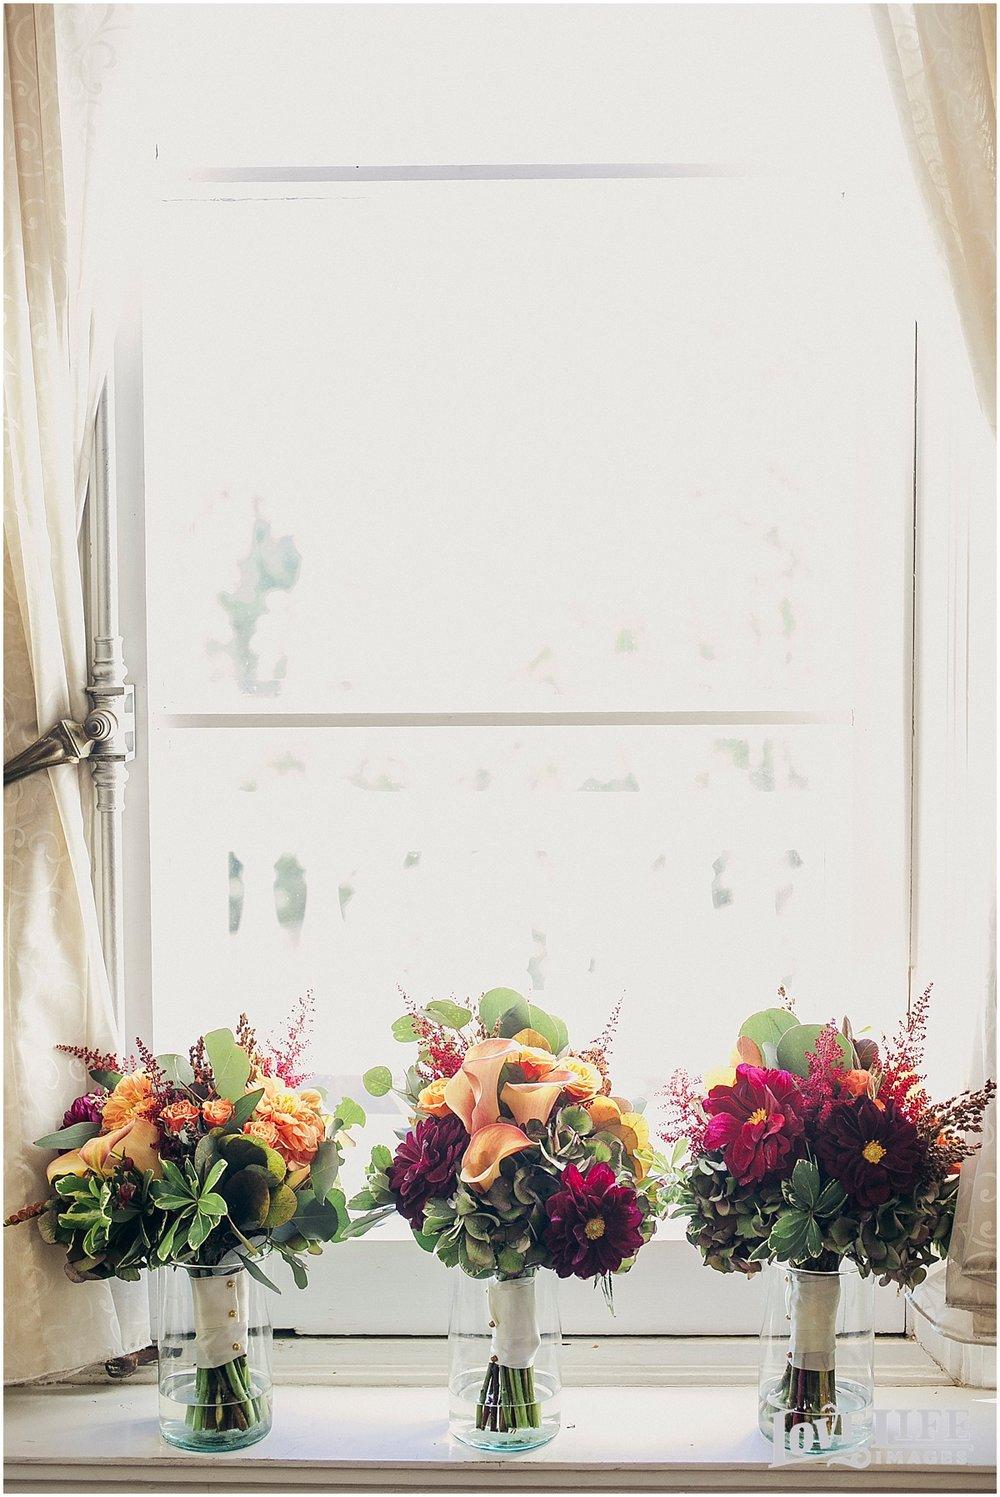 brielle-davis-events-oxon-hill-manor-wedding-bouquets.jpg